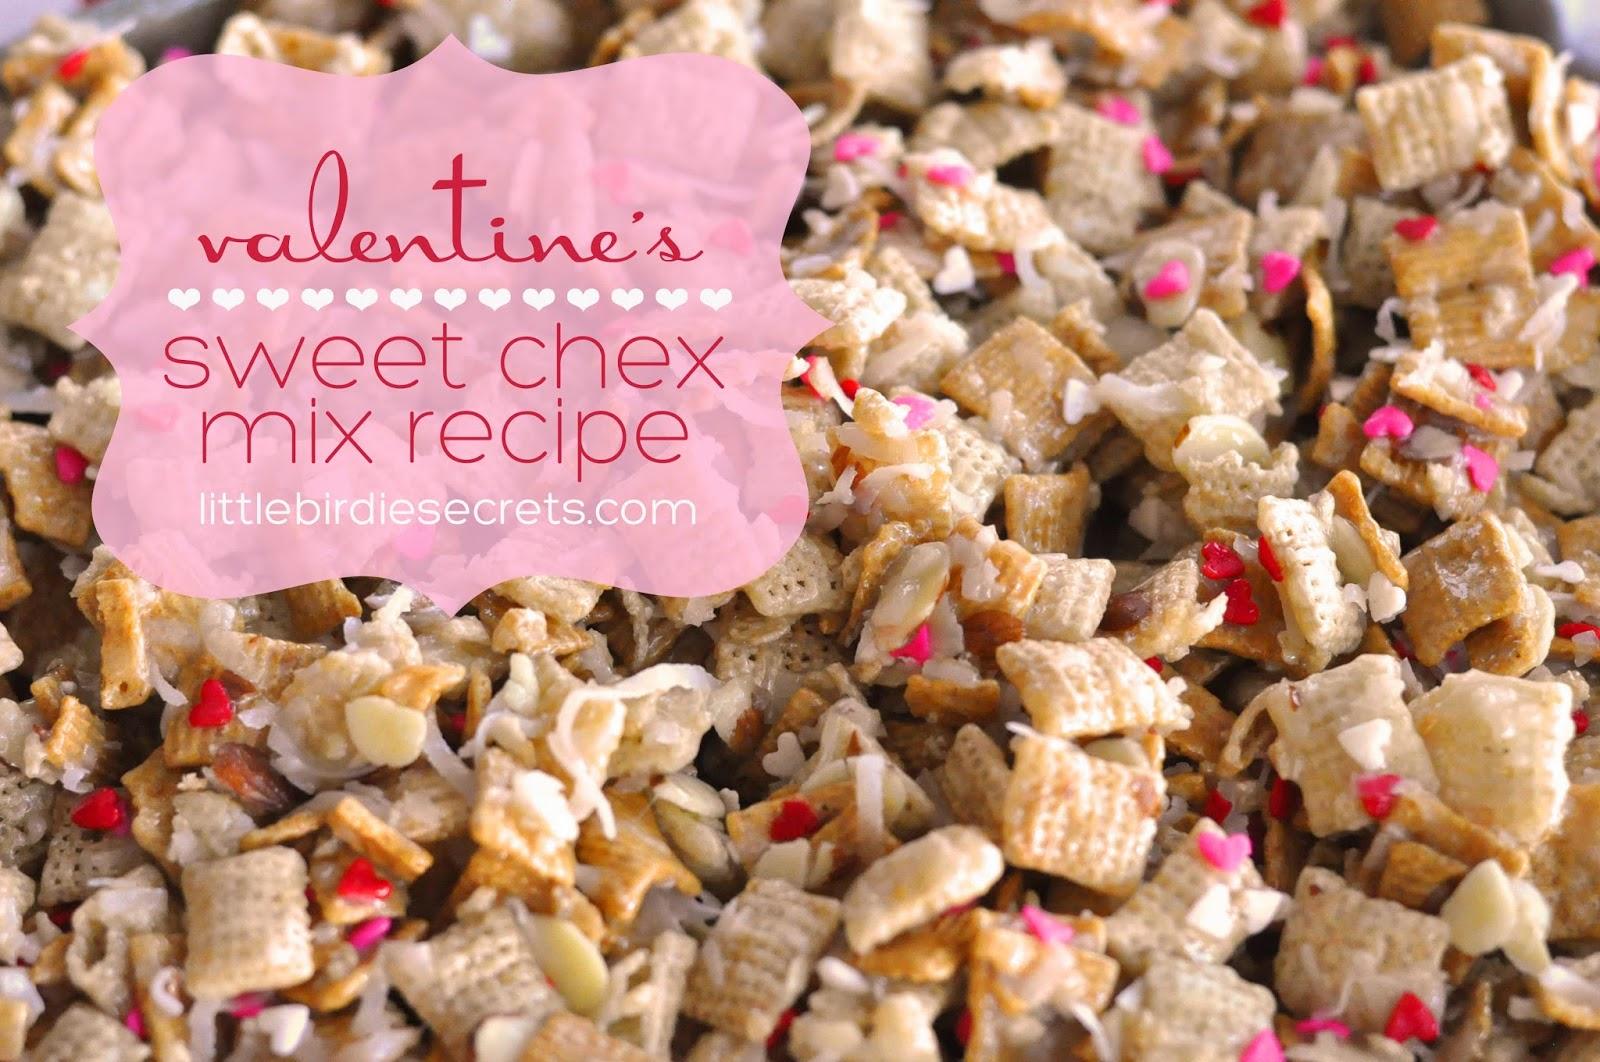 1 128 oz box rice chex cereal 1 12 oz box golden grahams cereal 1 7 oz bag shredded coconut 1 4 oz bag slivered almonds optional